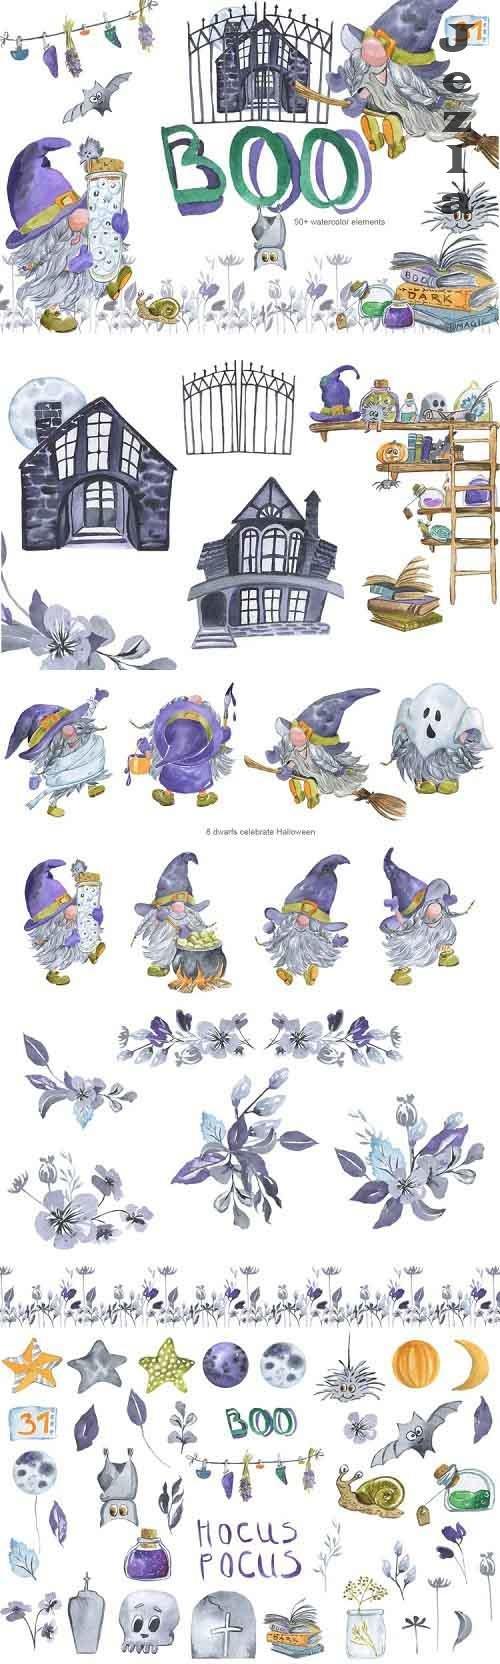 BOO! Gnomes Celebrate Halloween - 901043